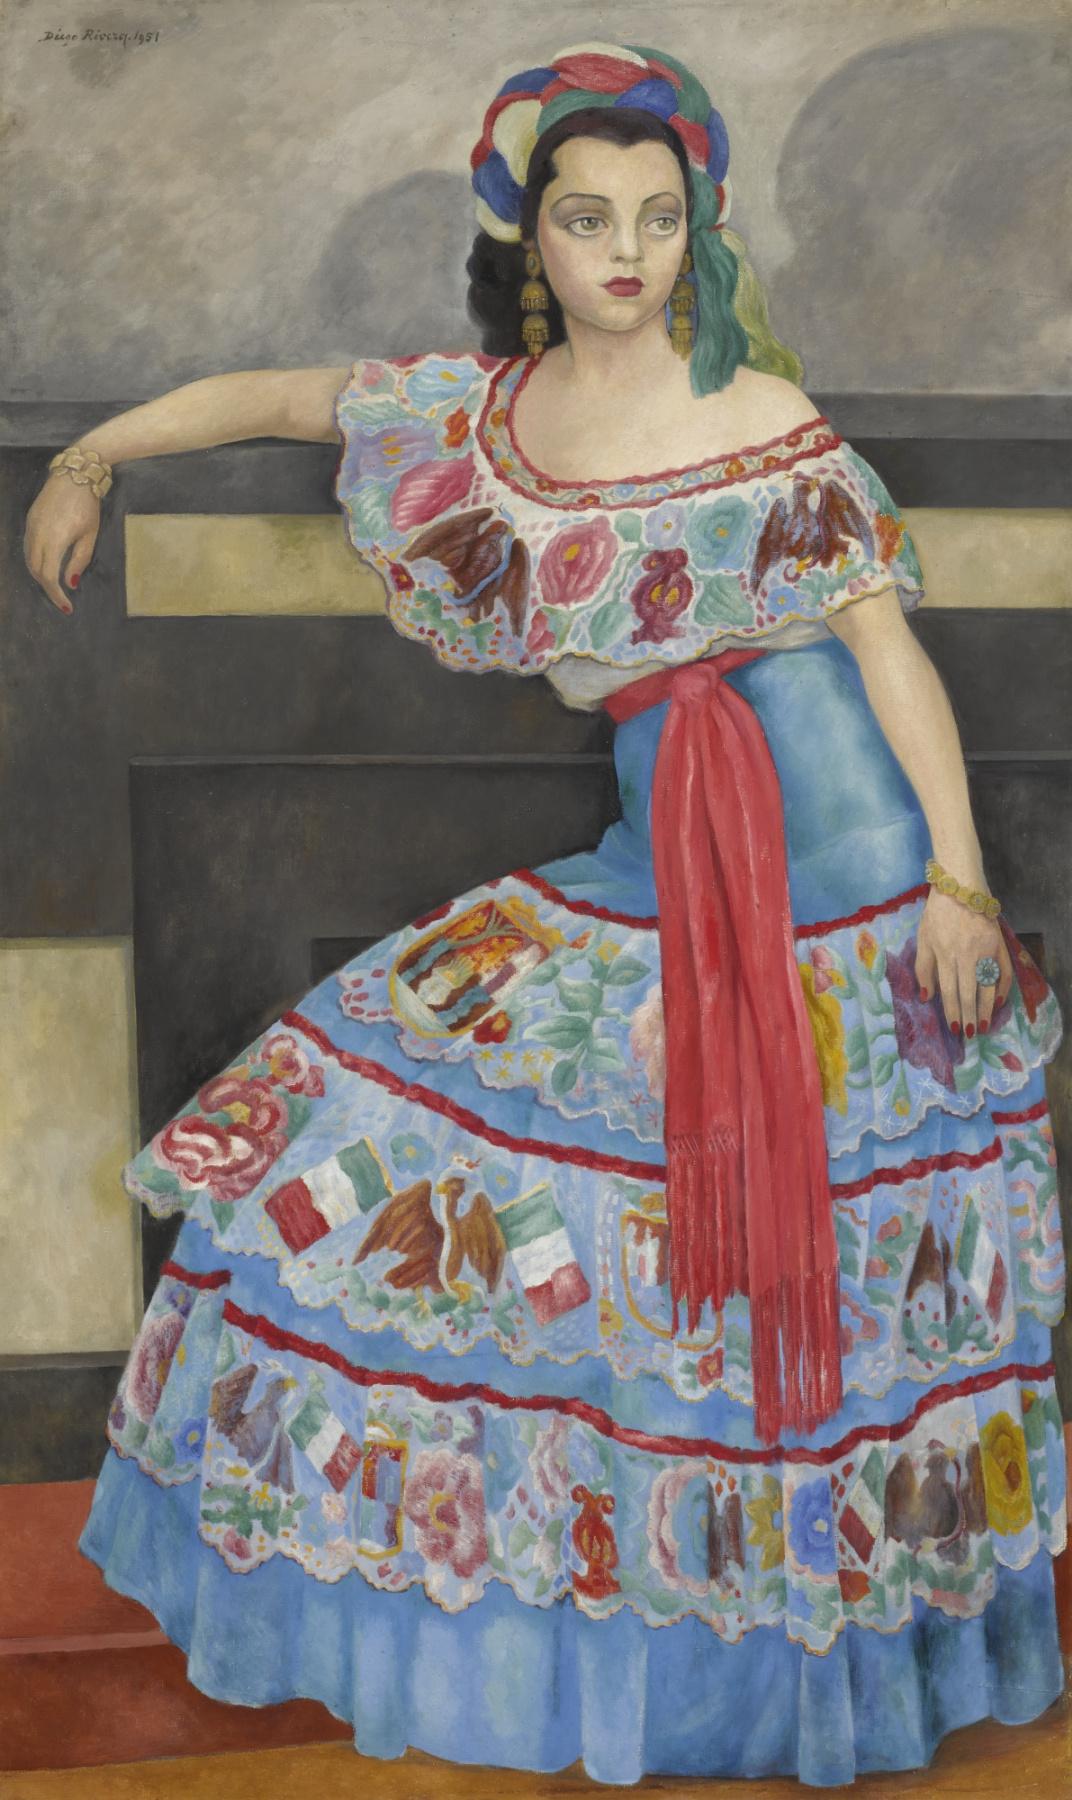 Diego Maria Rivera. Portrait of actress Matilda Palu